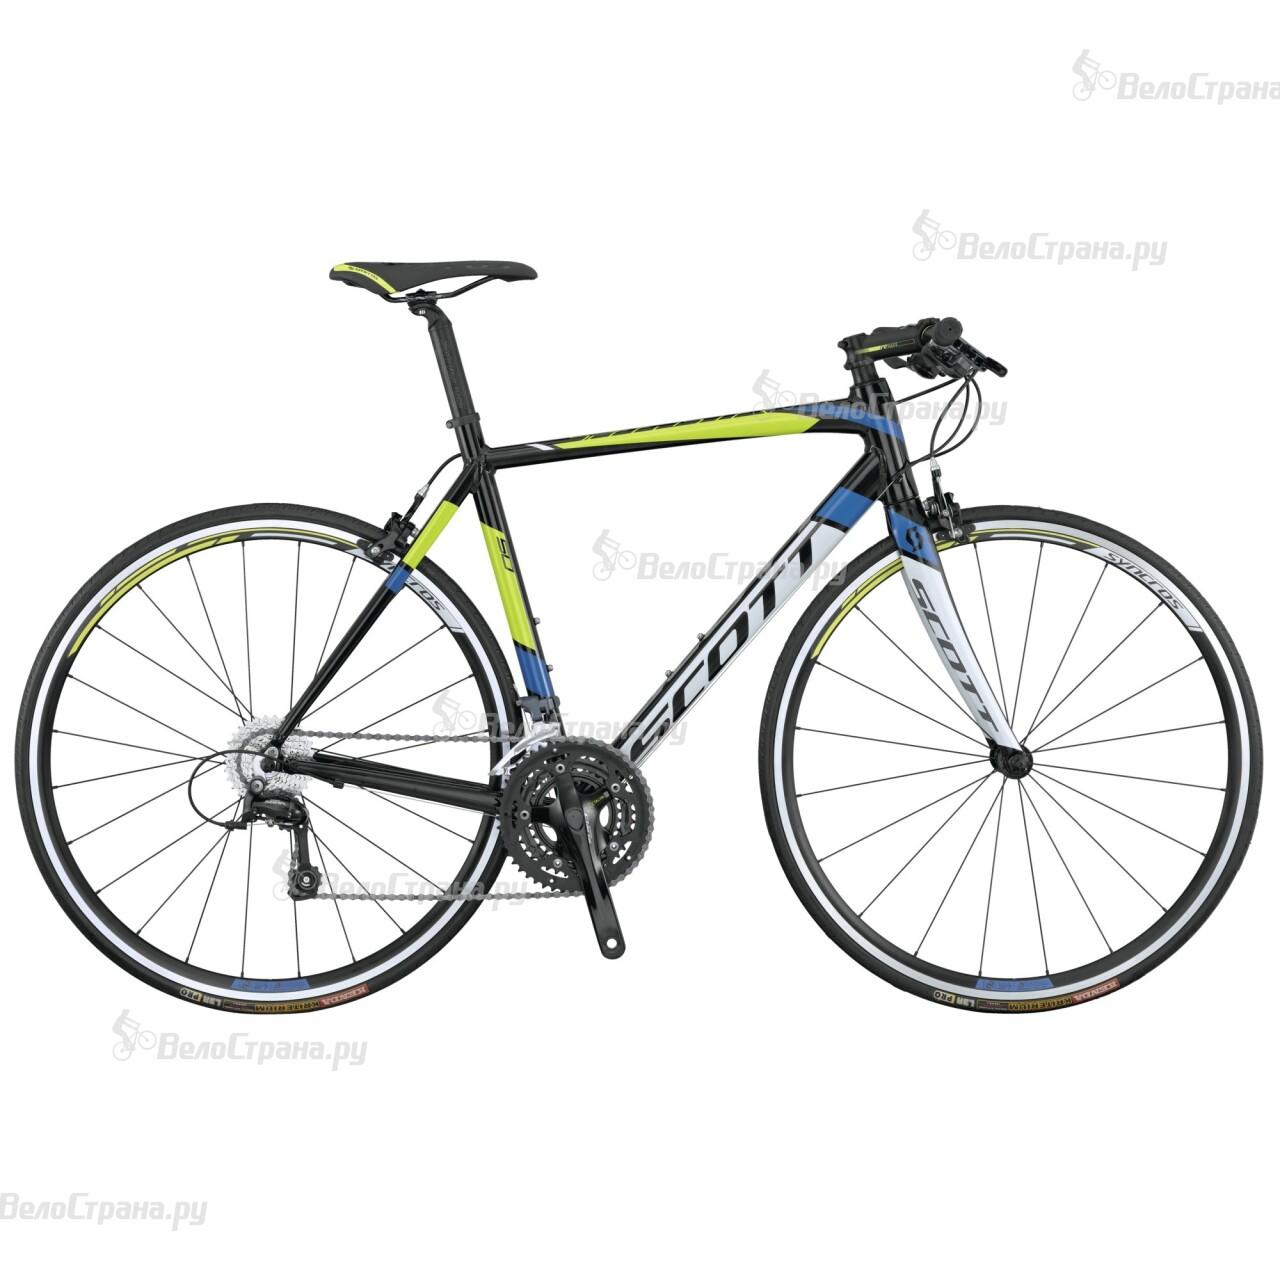 Велосипед Scott Speedster 50 (24) (2015)